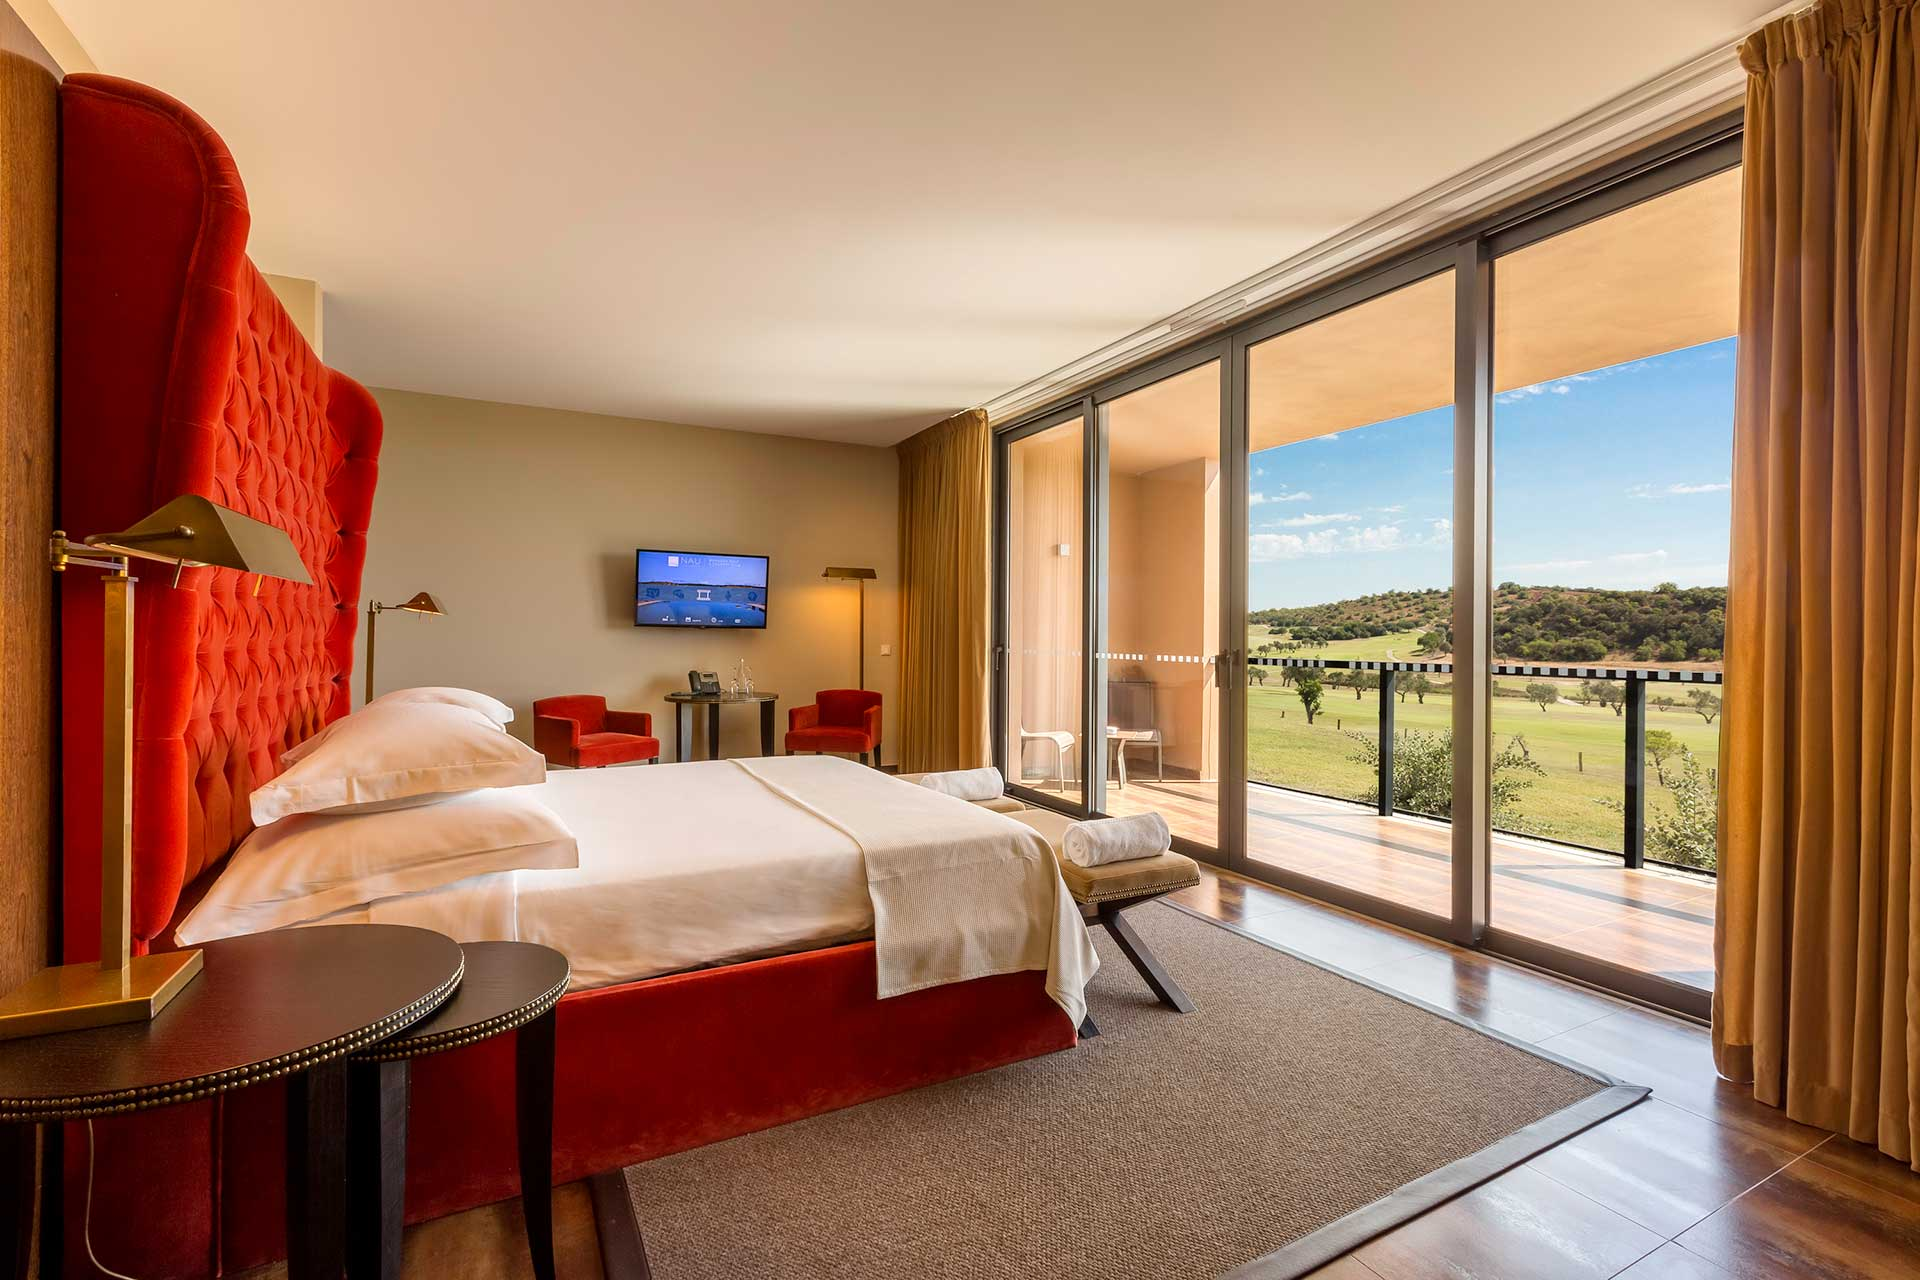 Golf-expedition-golfreizen-golfresort-Morgado-Golf-&-Country-Club-bedroom